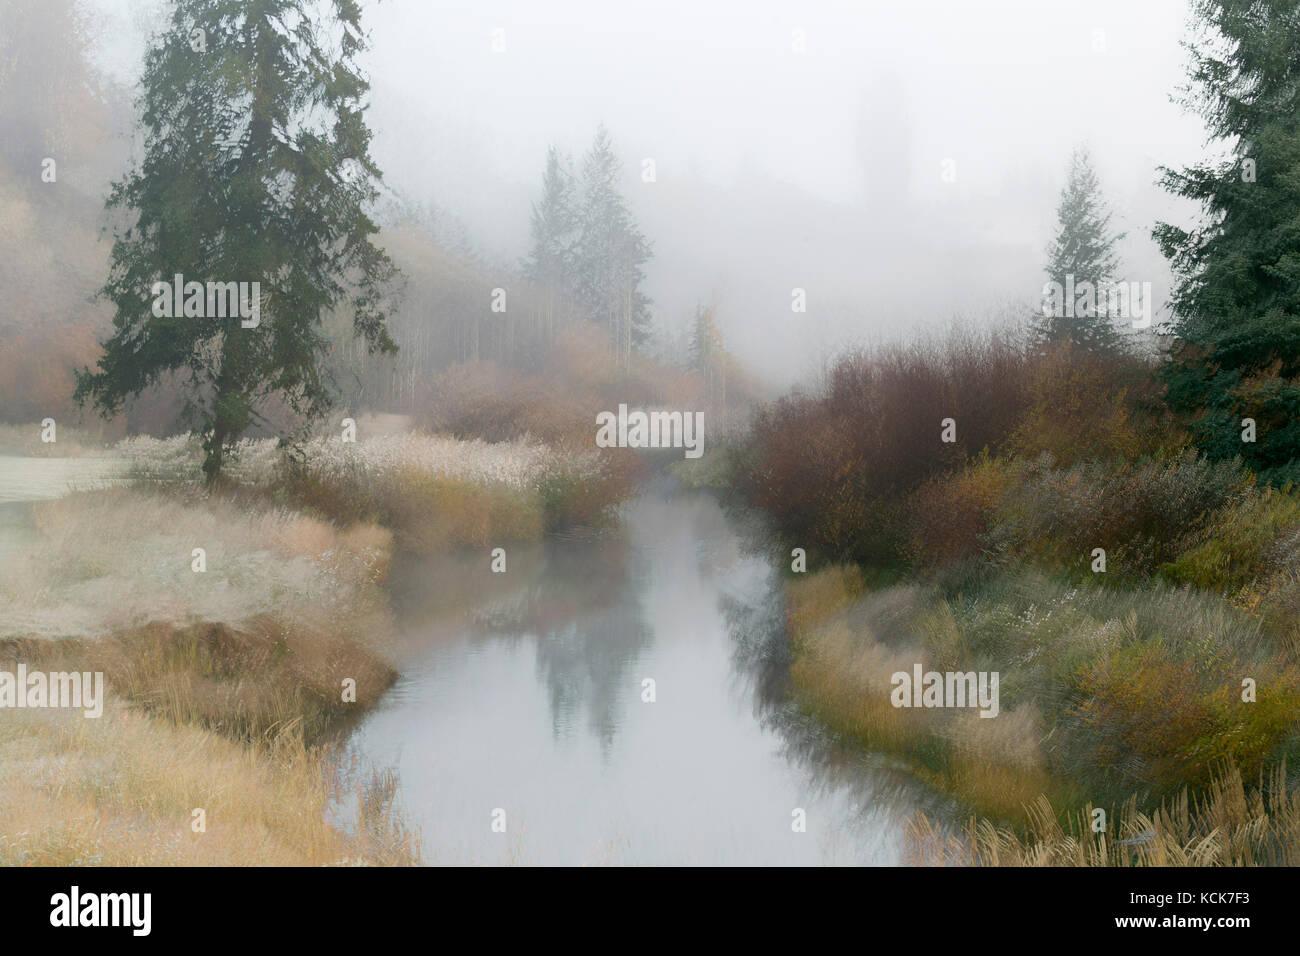 Canada, British Columbia, Centennial Park, 100 Mile House, Cariboo, Bridge Creek, abstract, landscape, autumn, fall - Stock Image